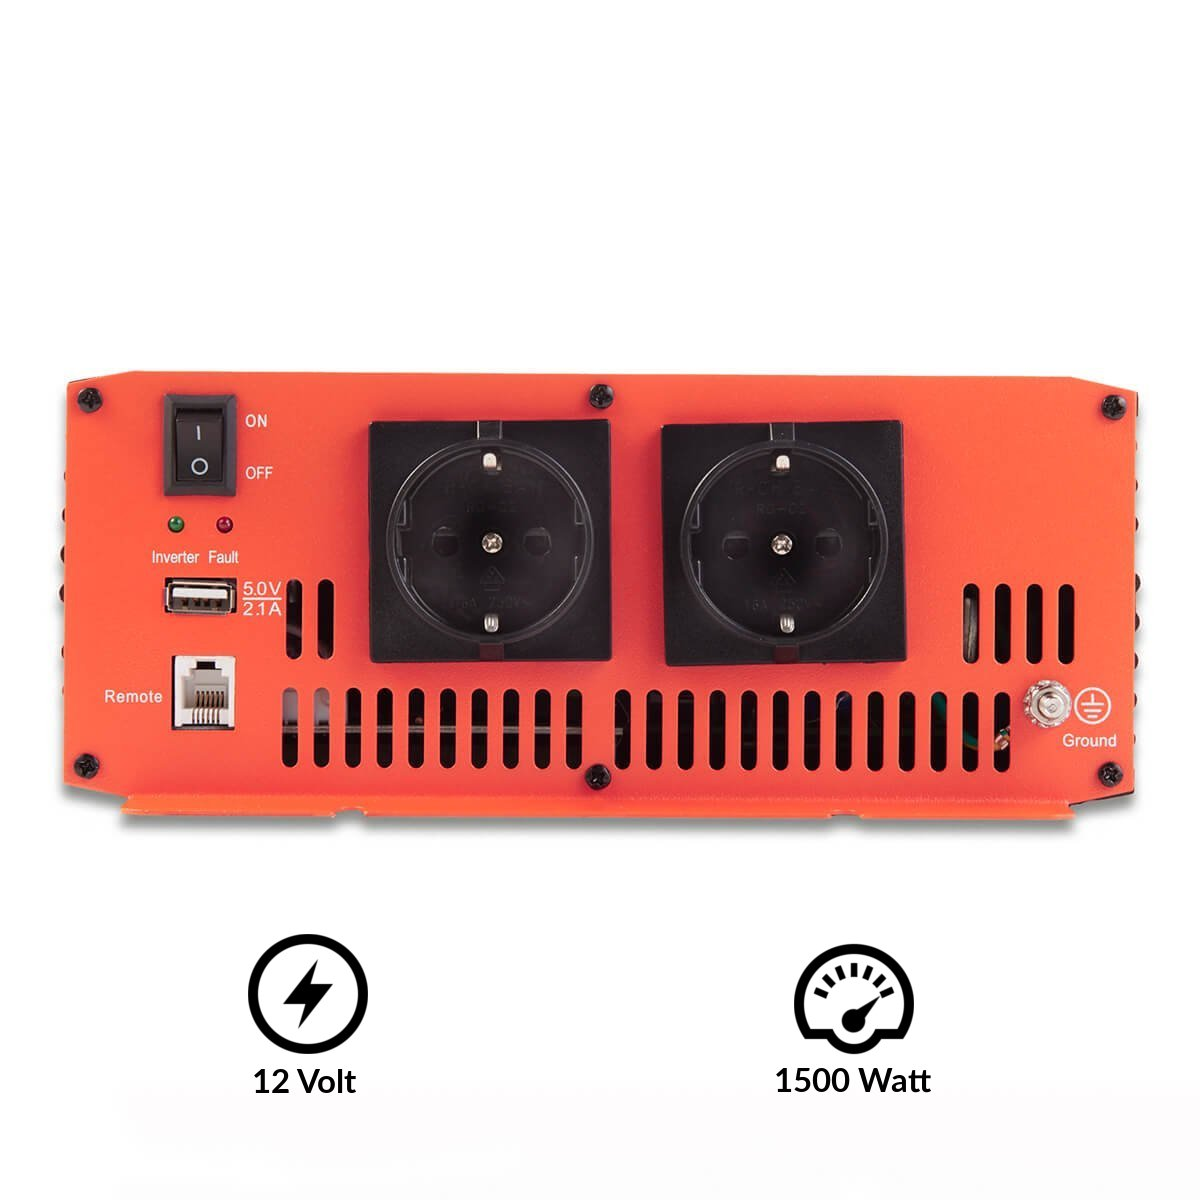 ECTIVE Serie SI caz | Inversor de onda sinusoidal 12V a 230V | 1500W | Los transformadores de tensión, transformadores de corriente, convertidor de energía, ...